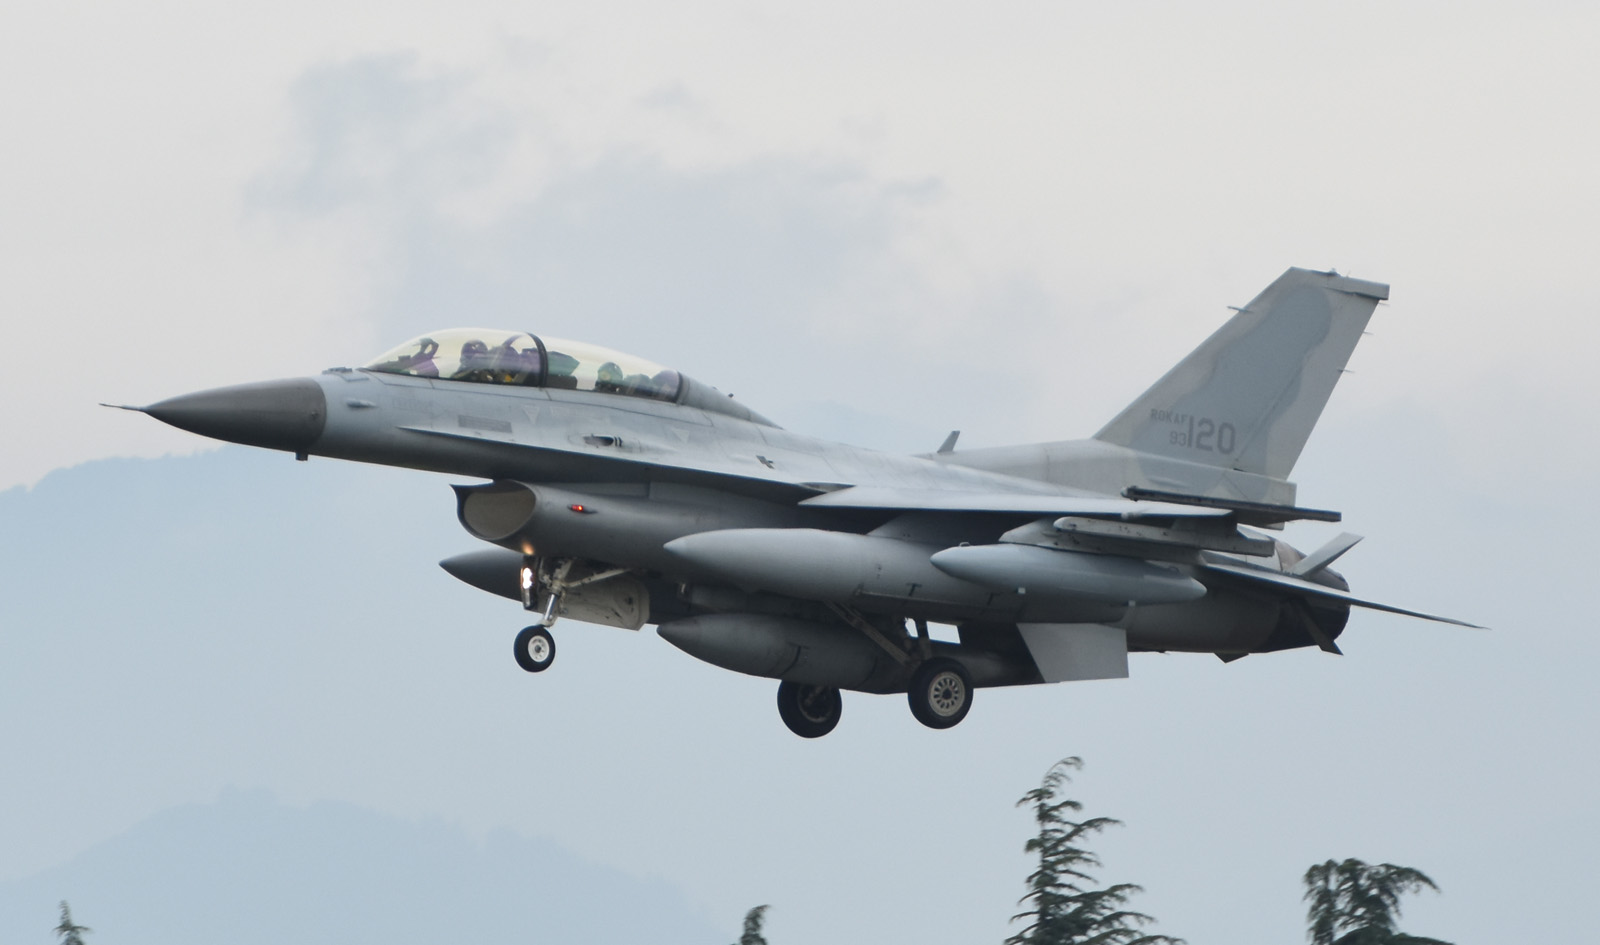 F16d170601g502